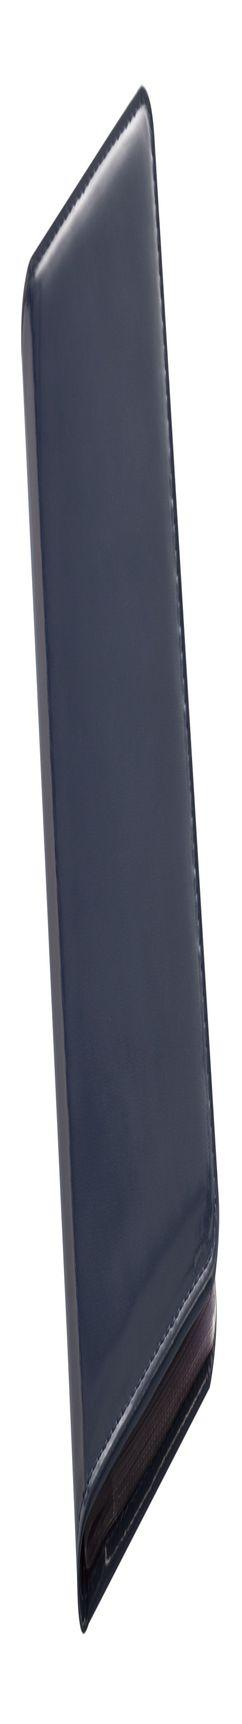 Визитница LUXE, синяя фото